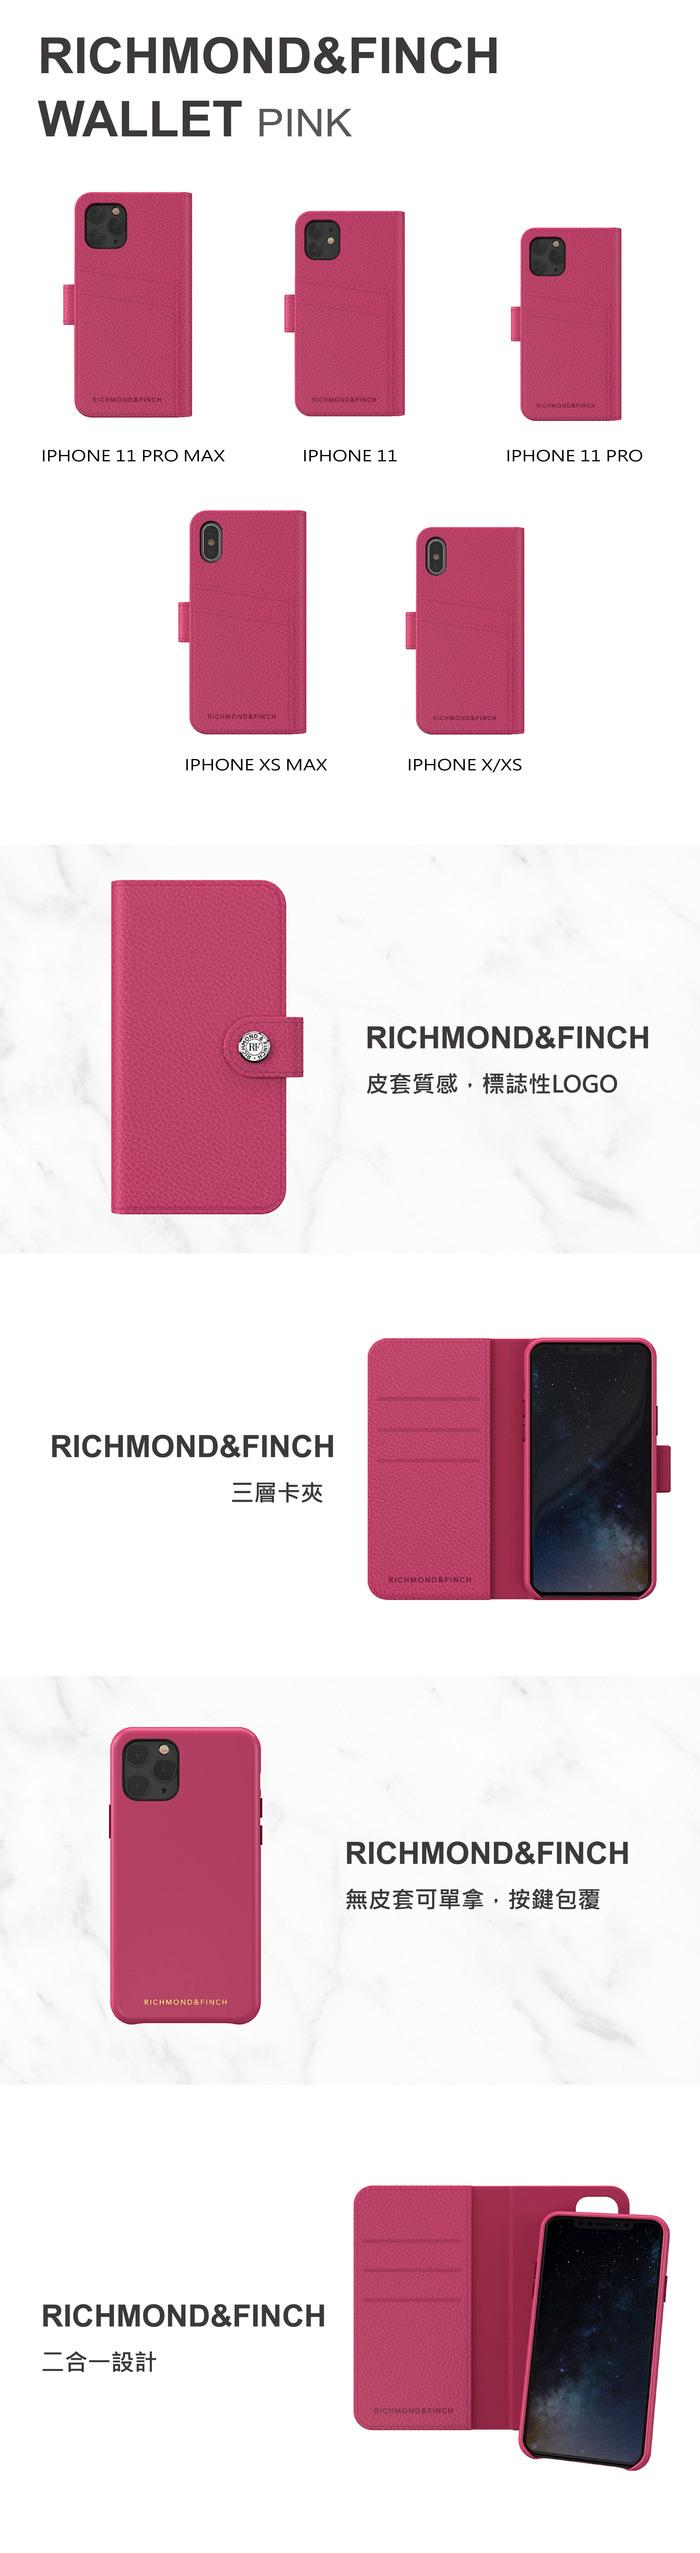 Richmond & Finch│iPhone 11 PRO MAX皮套手機殼-粉色